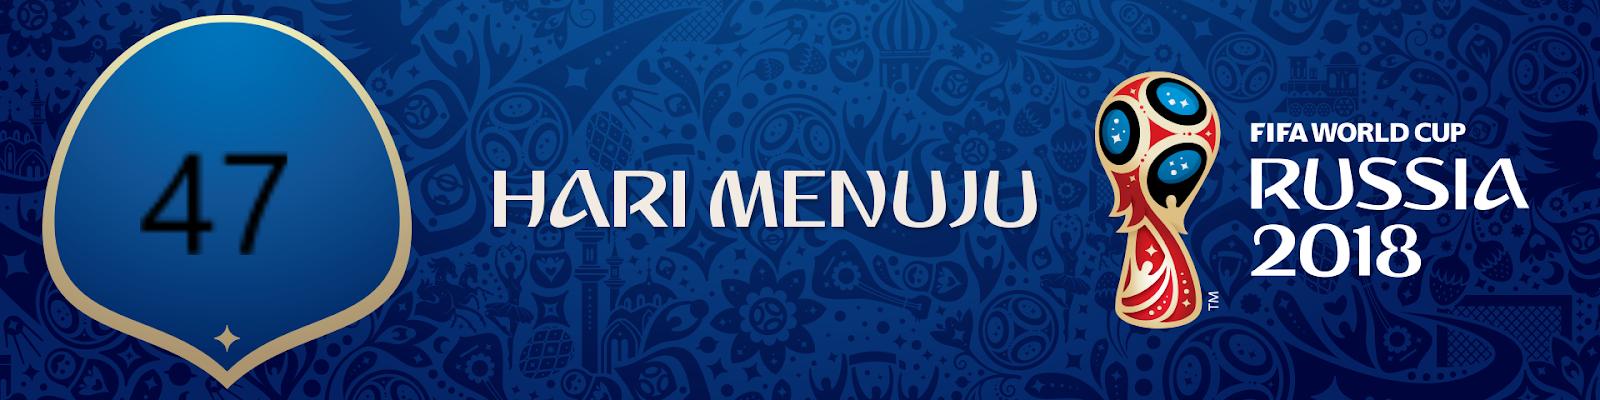 47 Hari Lagi Menuju Piala Dunia 2018 ~ IBOSport World Cup 2018